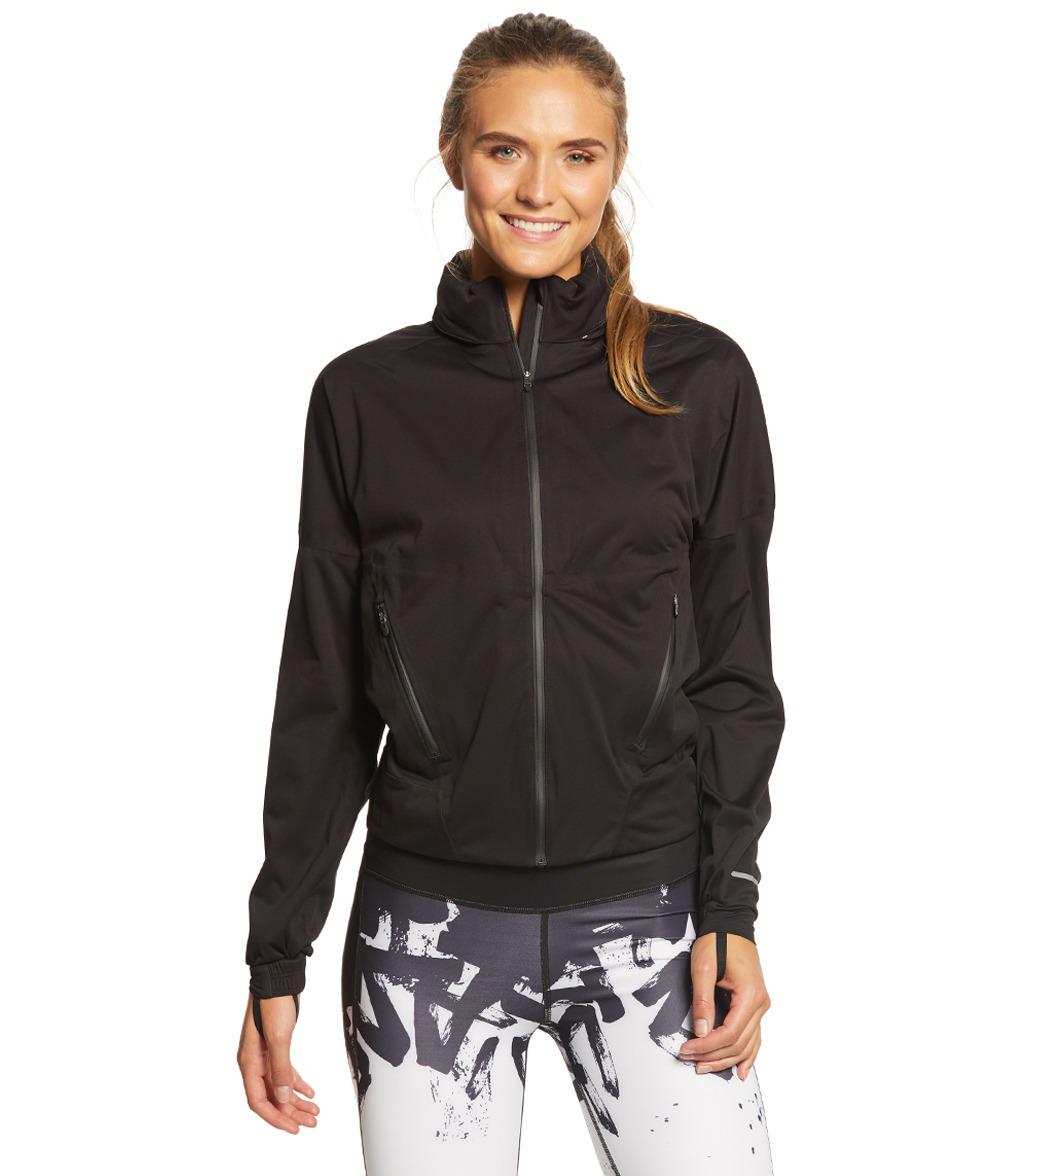 favorito preferible Ojalá  Asics Women's Accelerate Jacket at SwimOutlet.com - Free Shipping